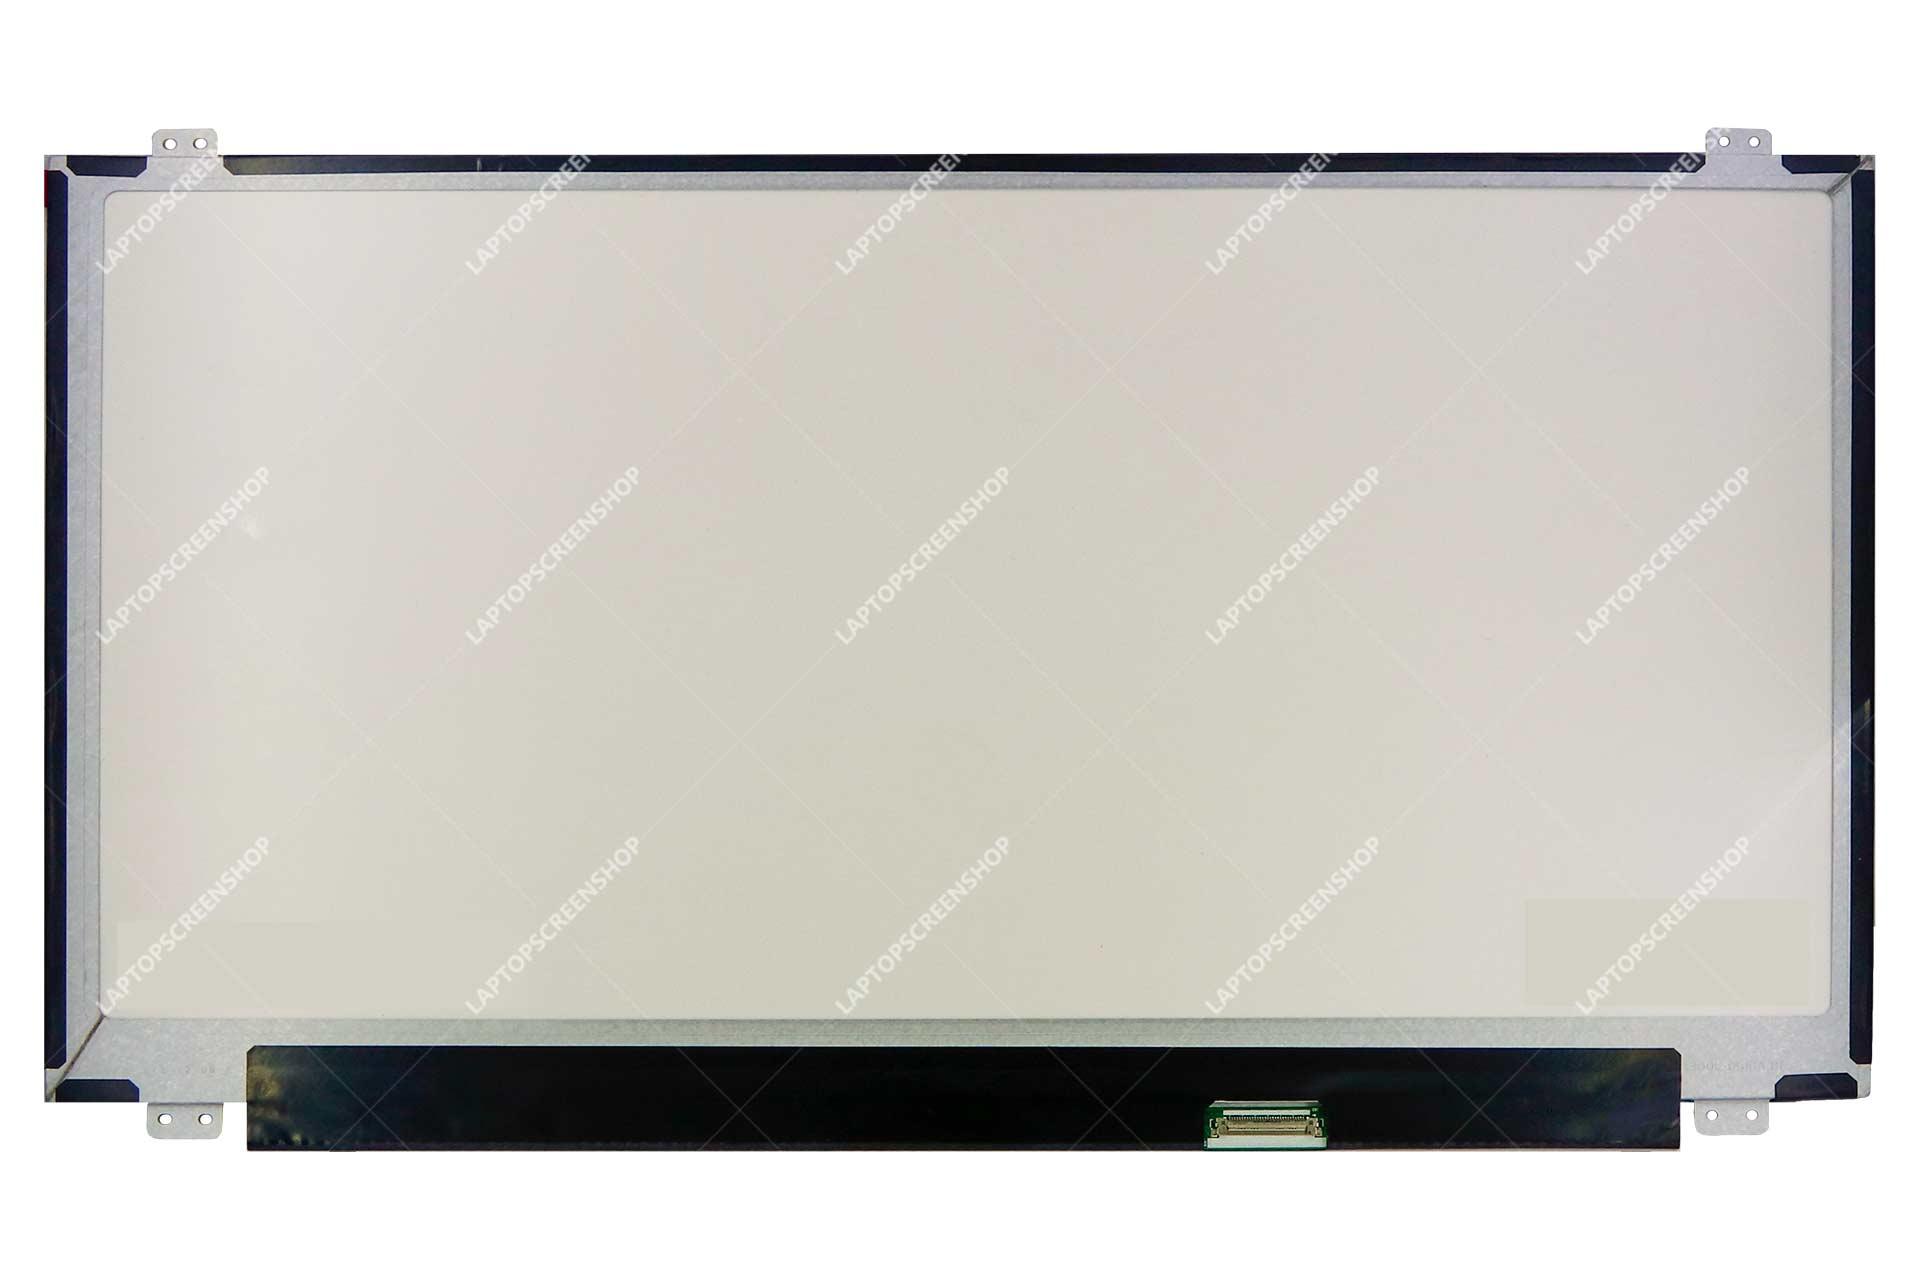 ACER-ASPIRE-E1-532-2625-LCD |HD|فروشگاه لپ تاپ اسکرين | تعمير لپ تاپ